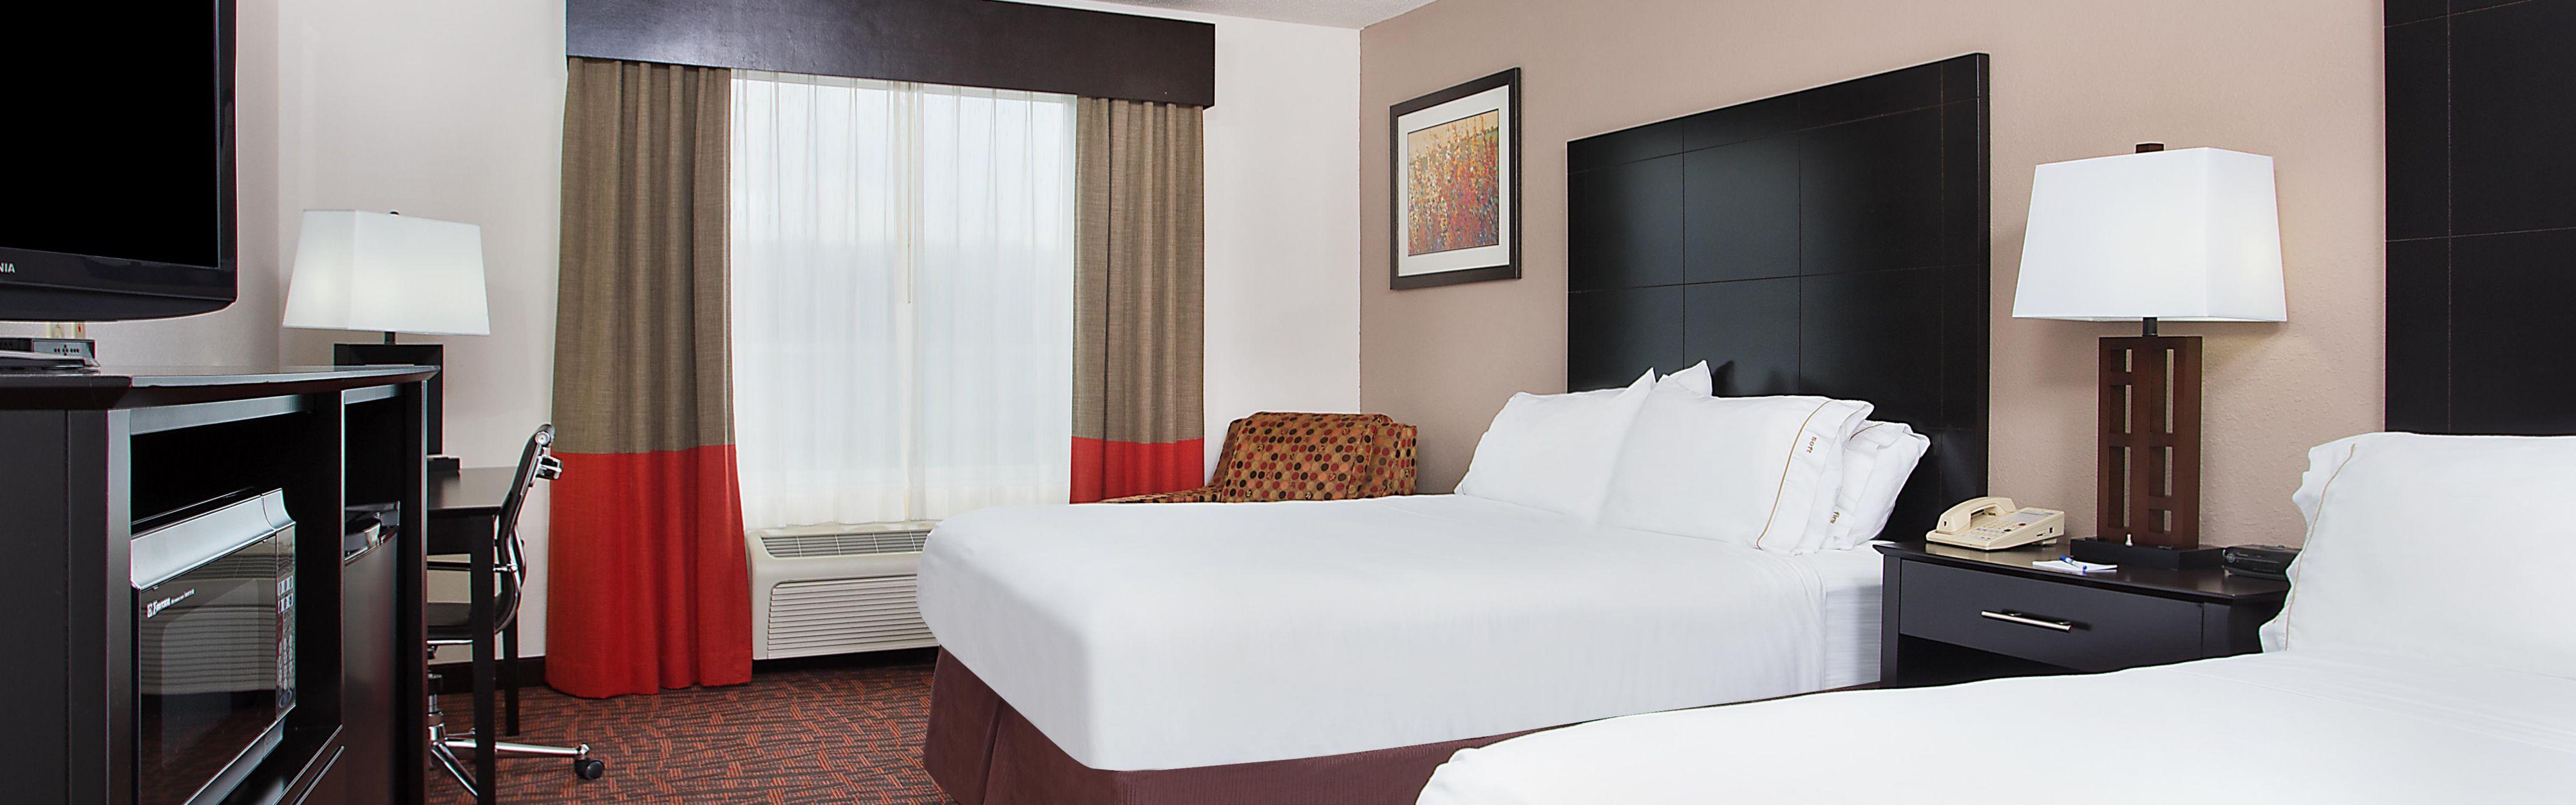 Holiday Inn Express Murphy image 1